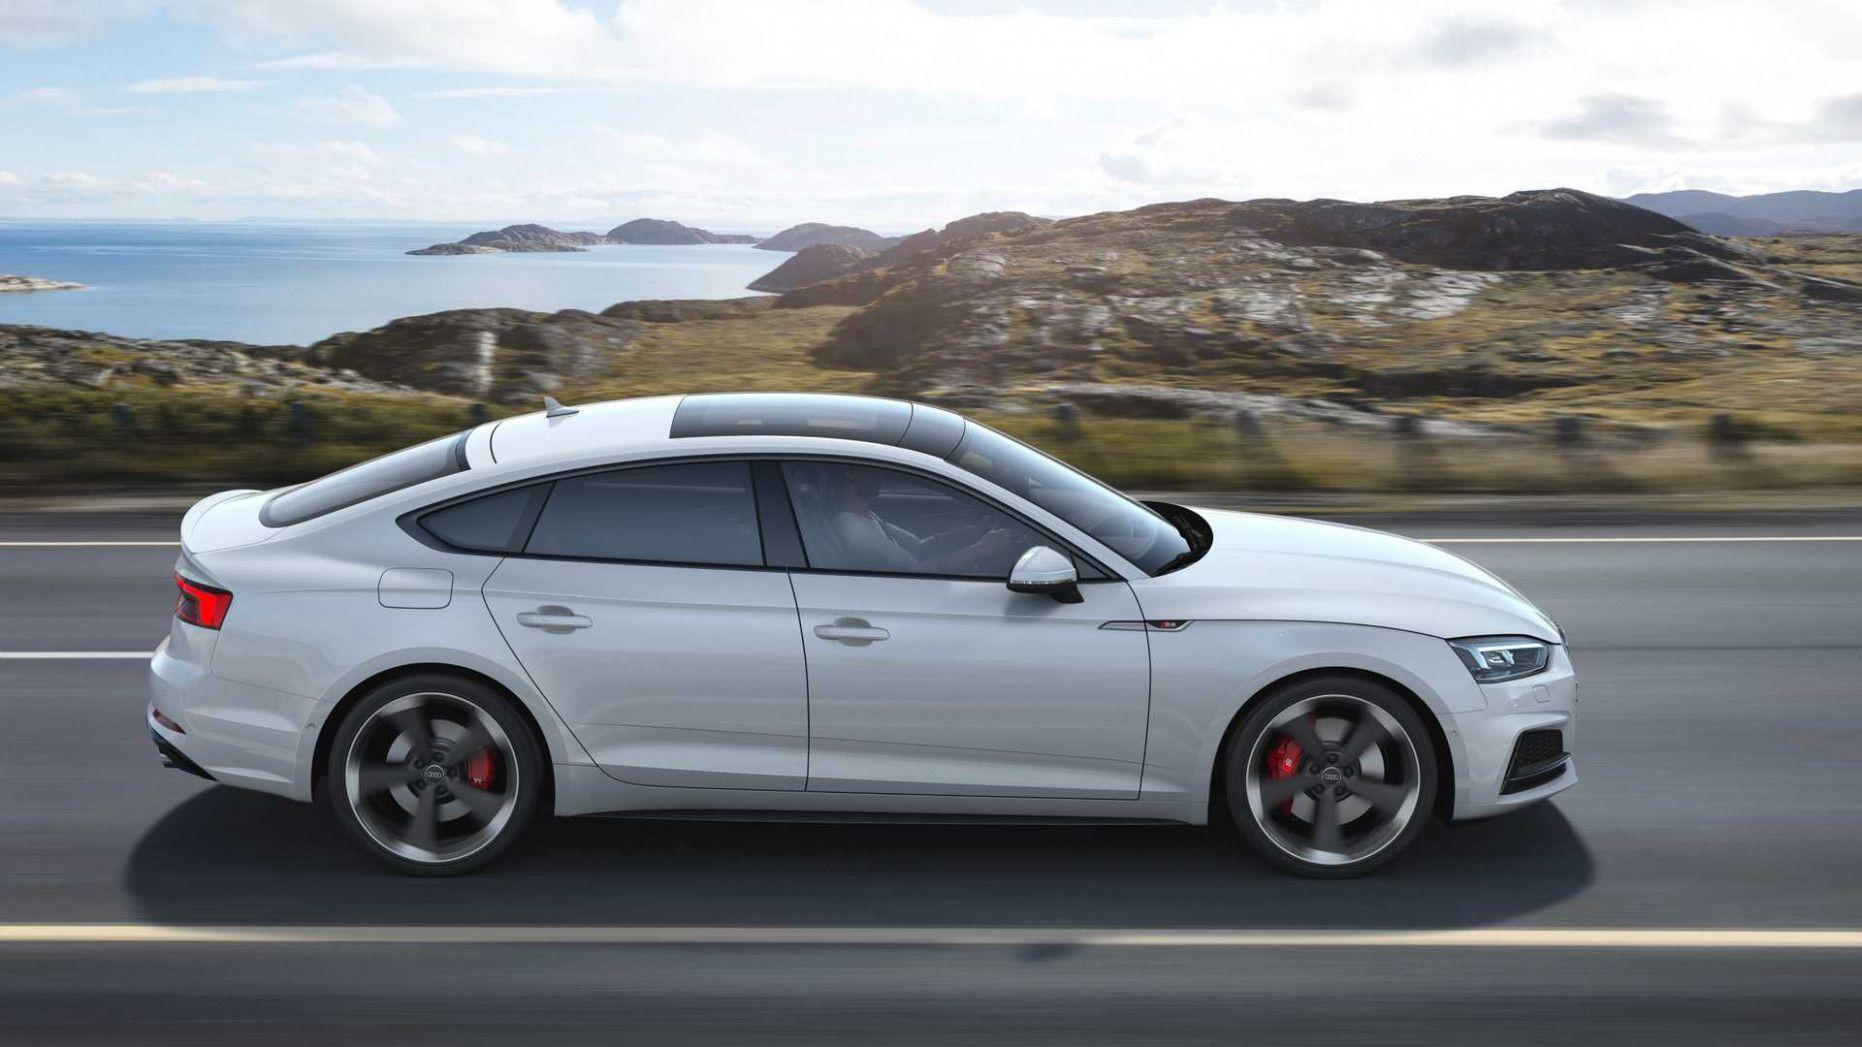 2020 Audi Rs5 Tdi Exterior In 2020 Audi A5 Audi A5 Coupe Audi S5